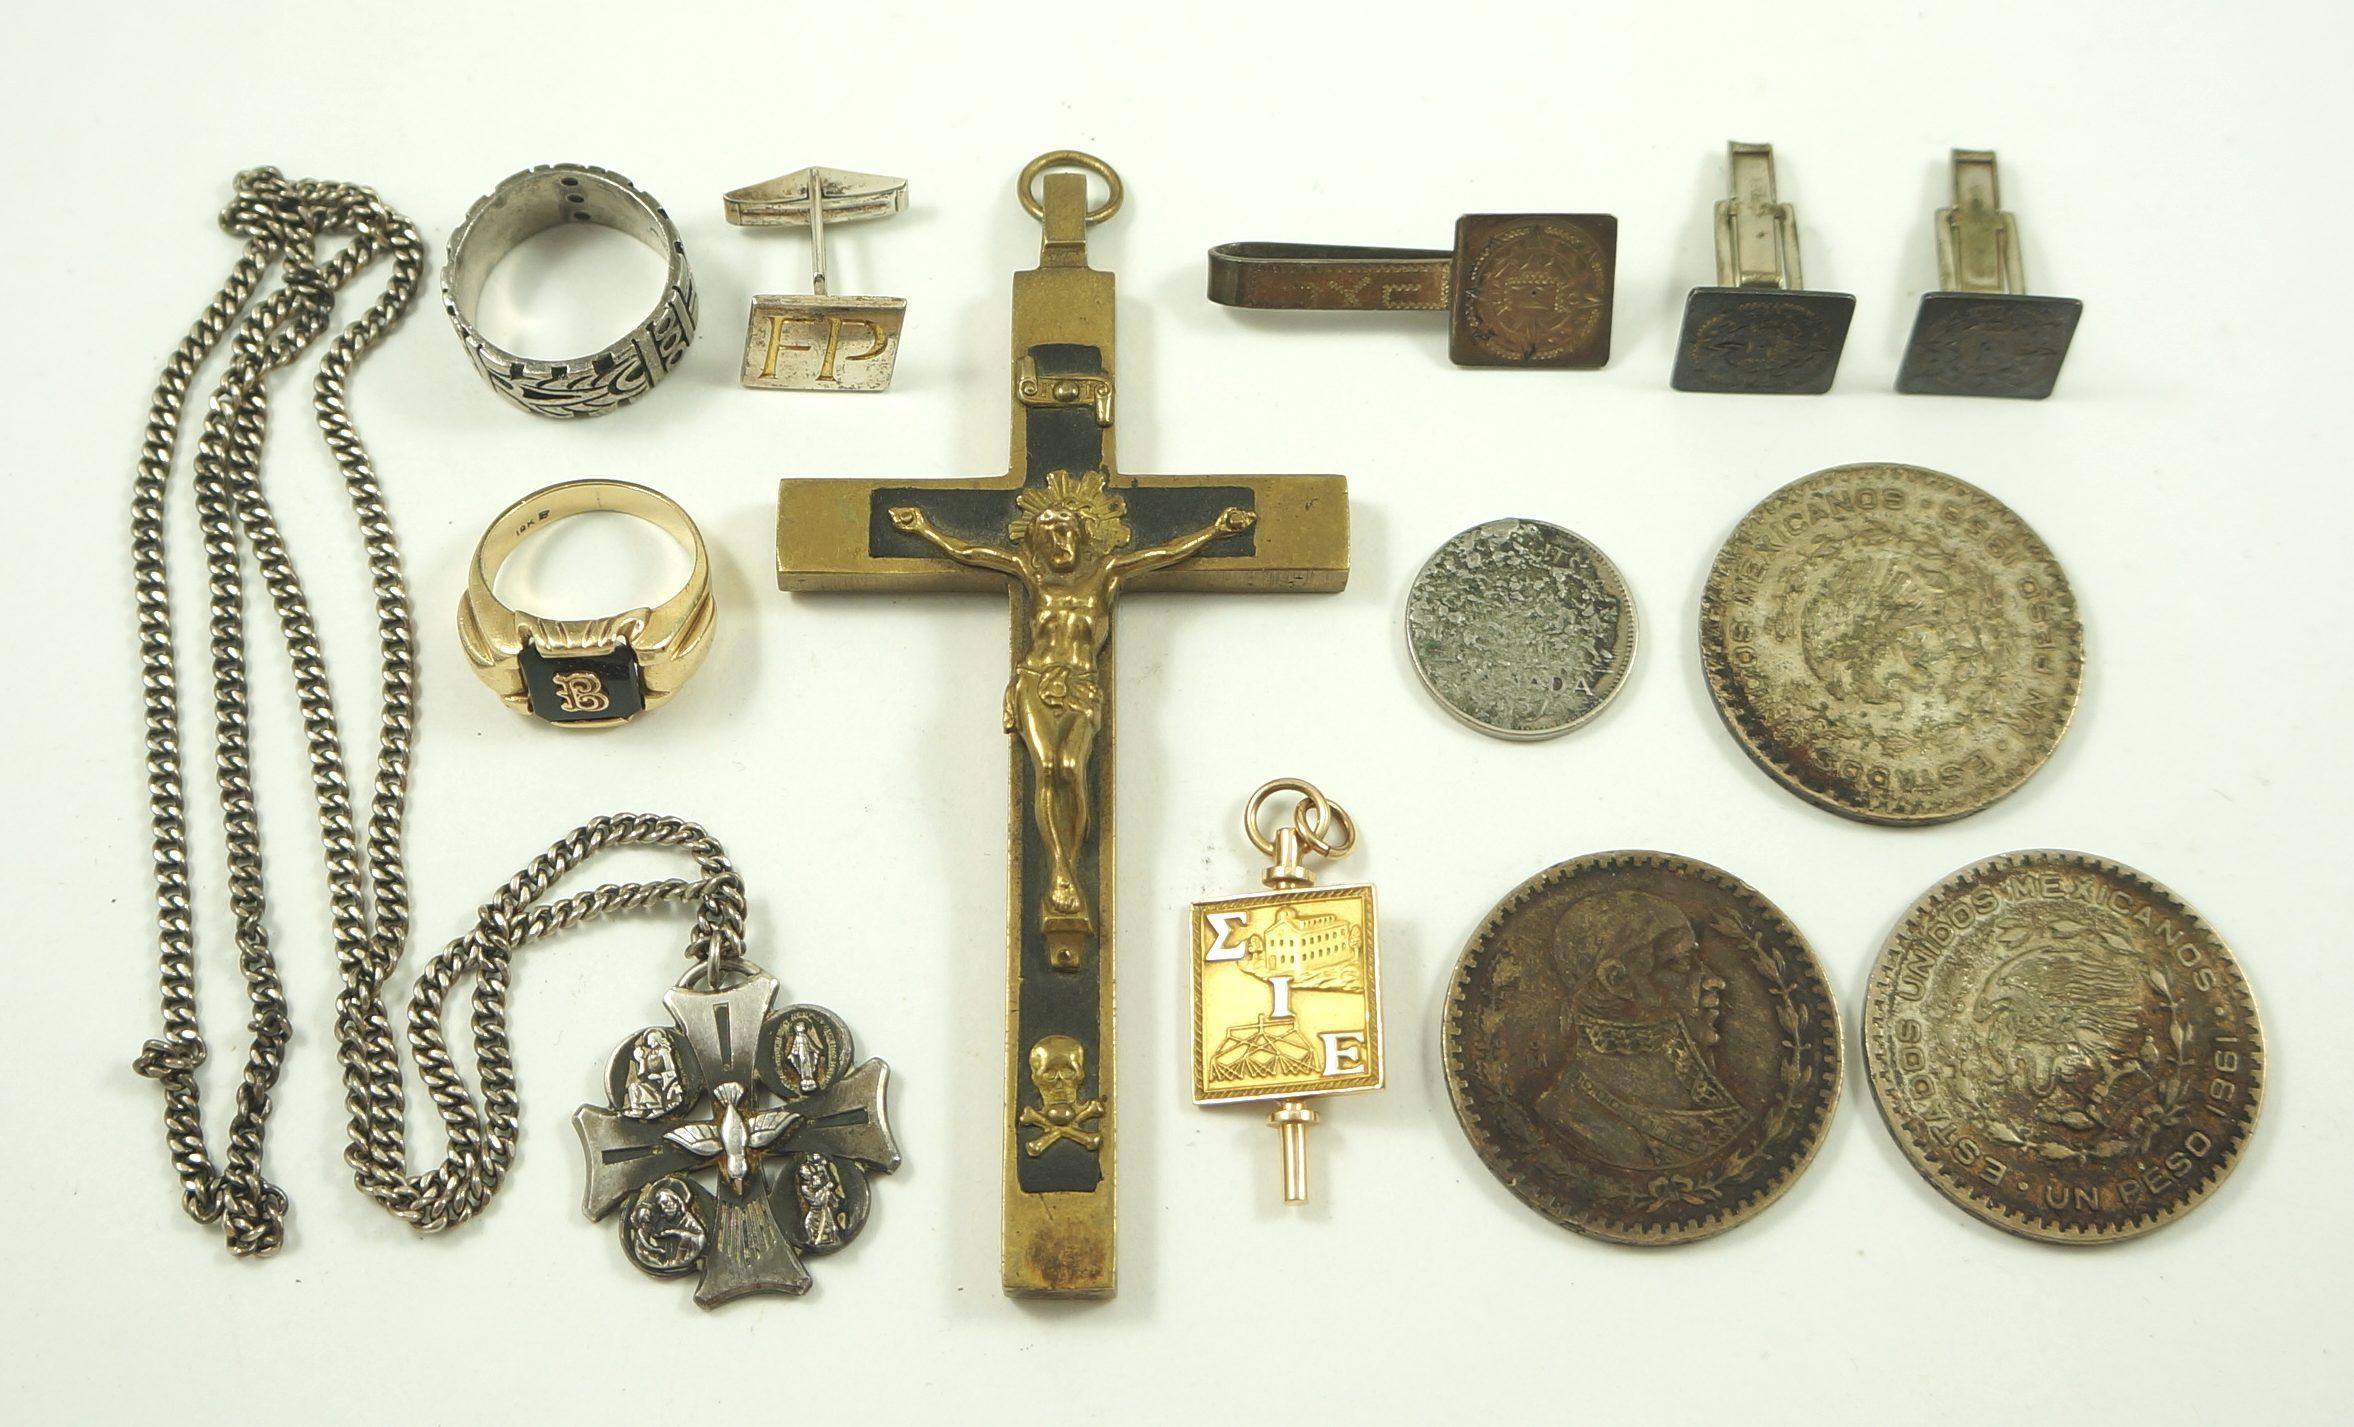 vintage – Things I find in the garbage